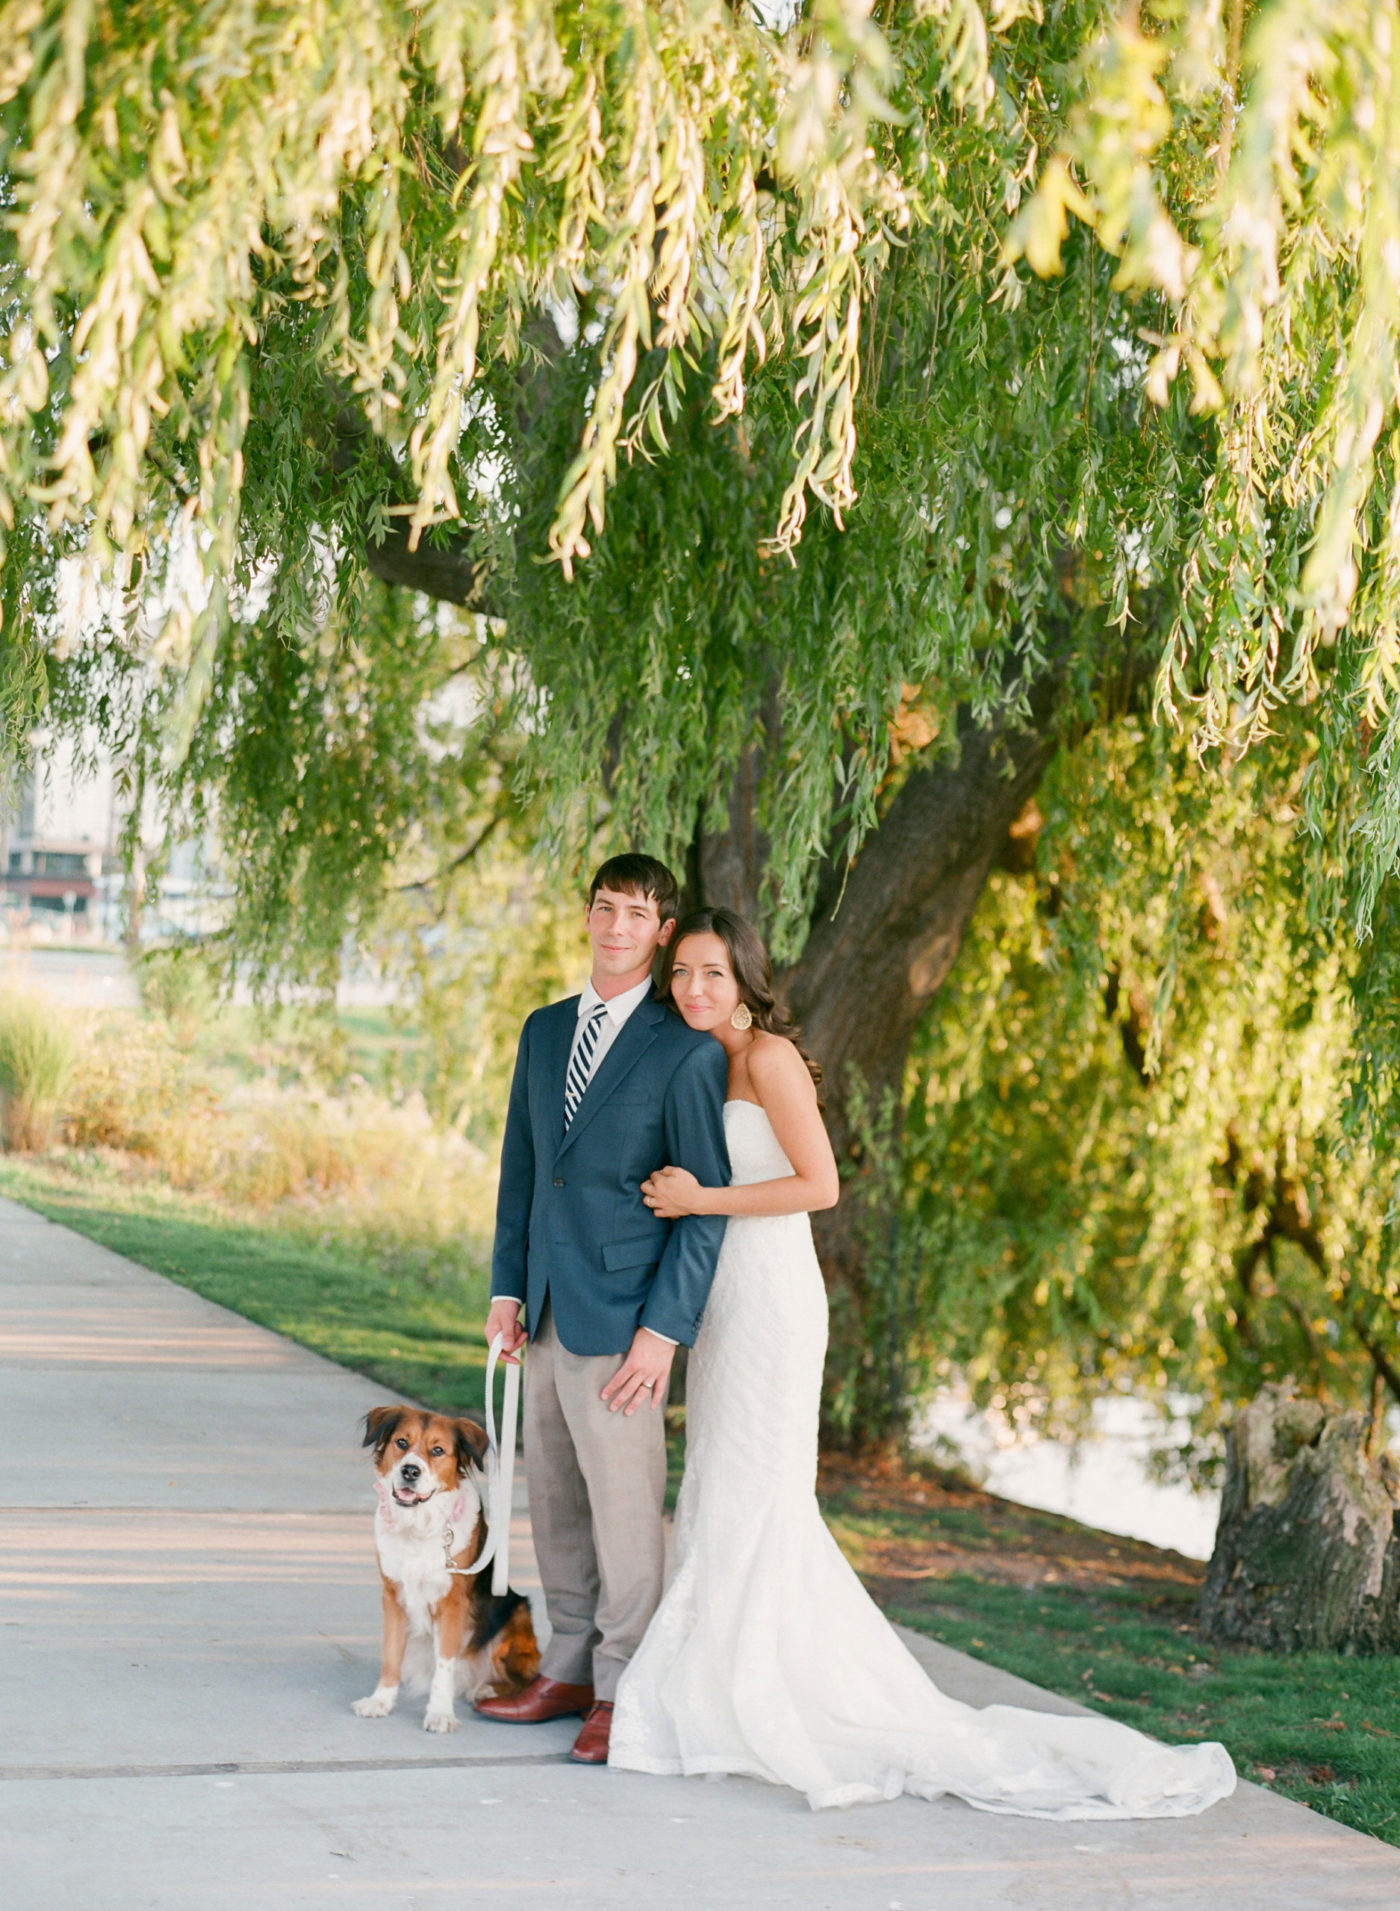 seattle husband wife wedding photography team